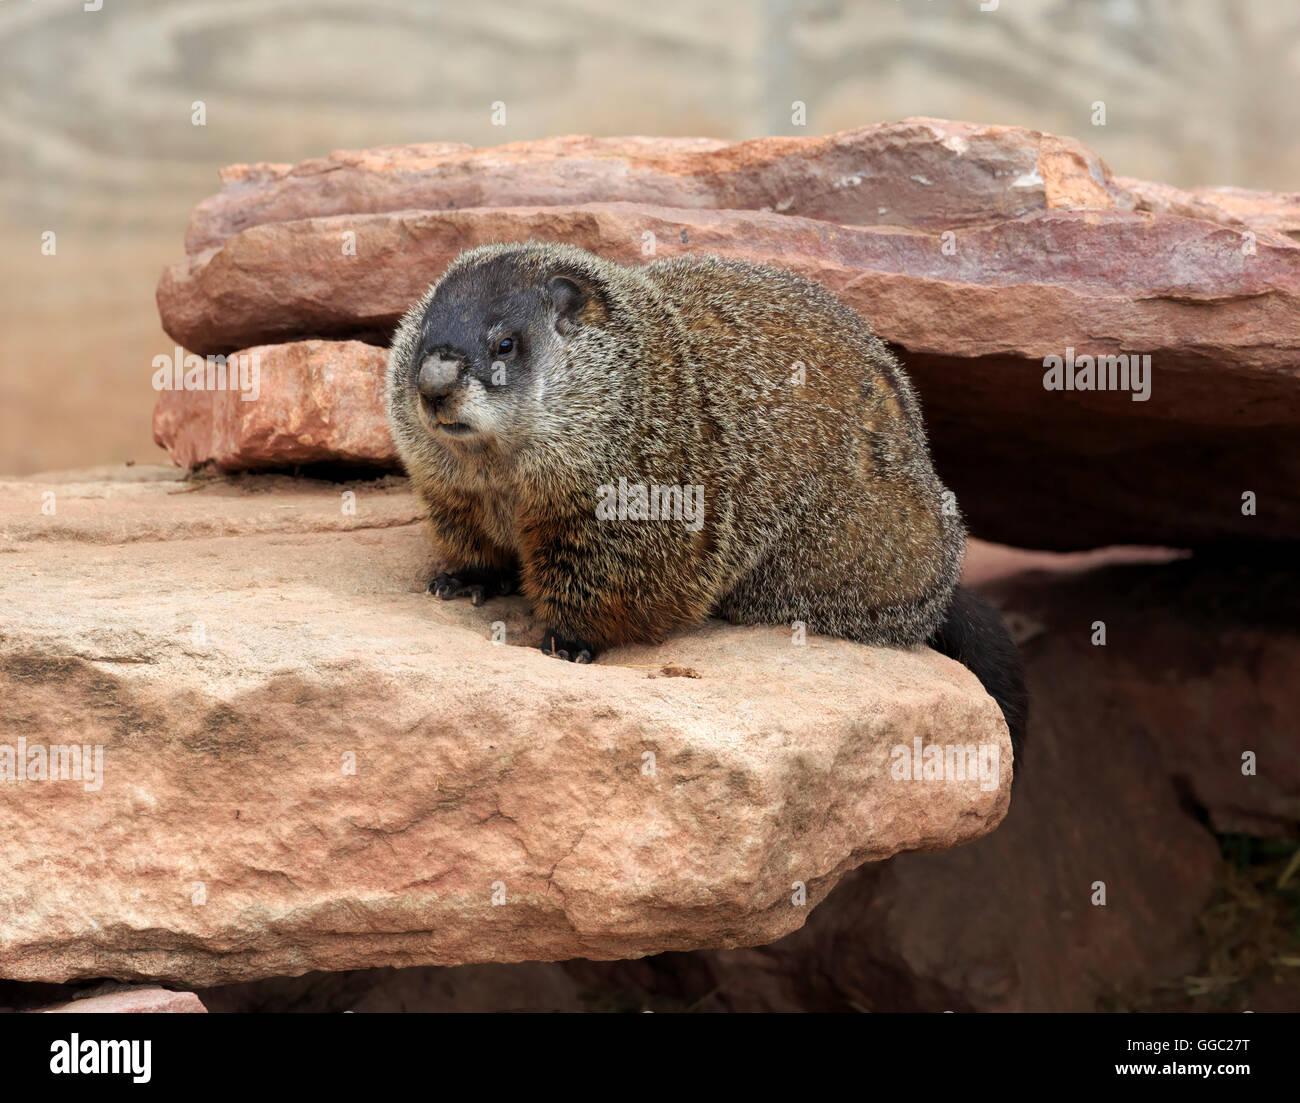 Groundhog, Marmota monax - Stock Image